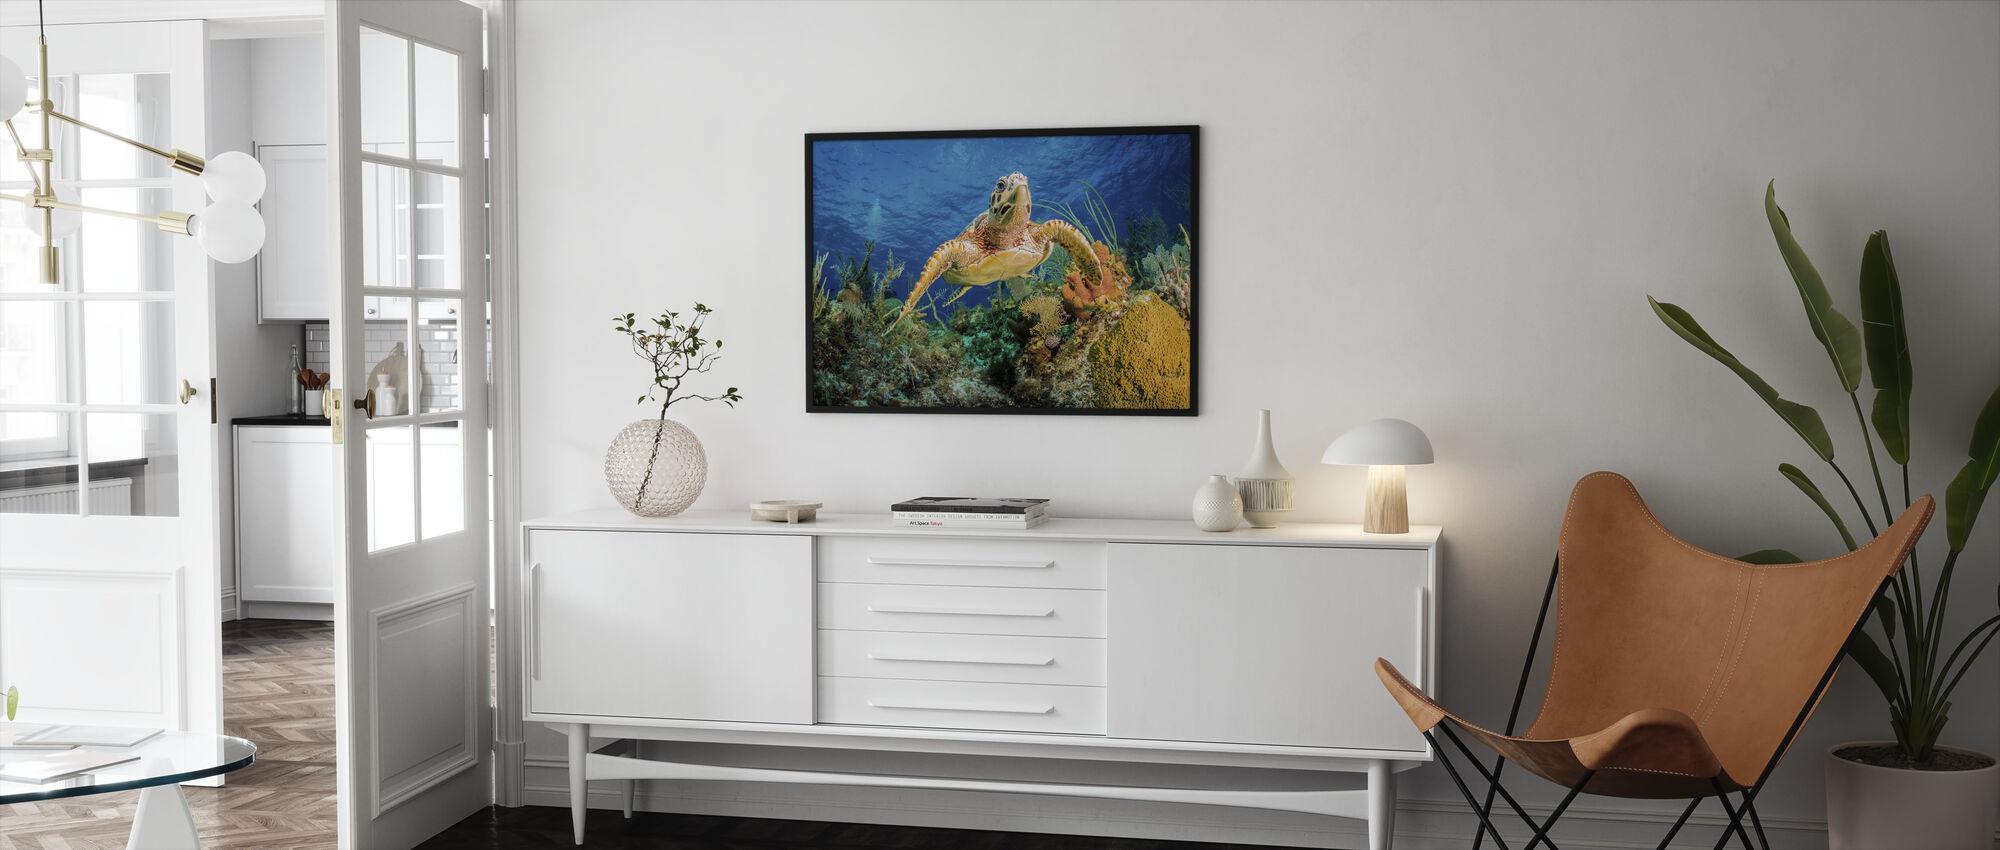 Hawksbill Turtle Swimming - Framed print - Living Room